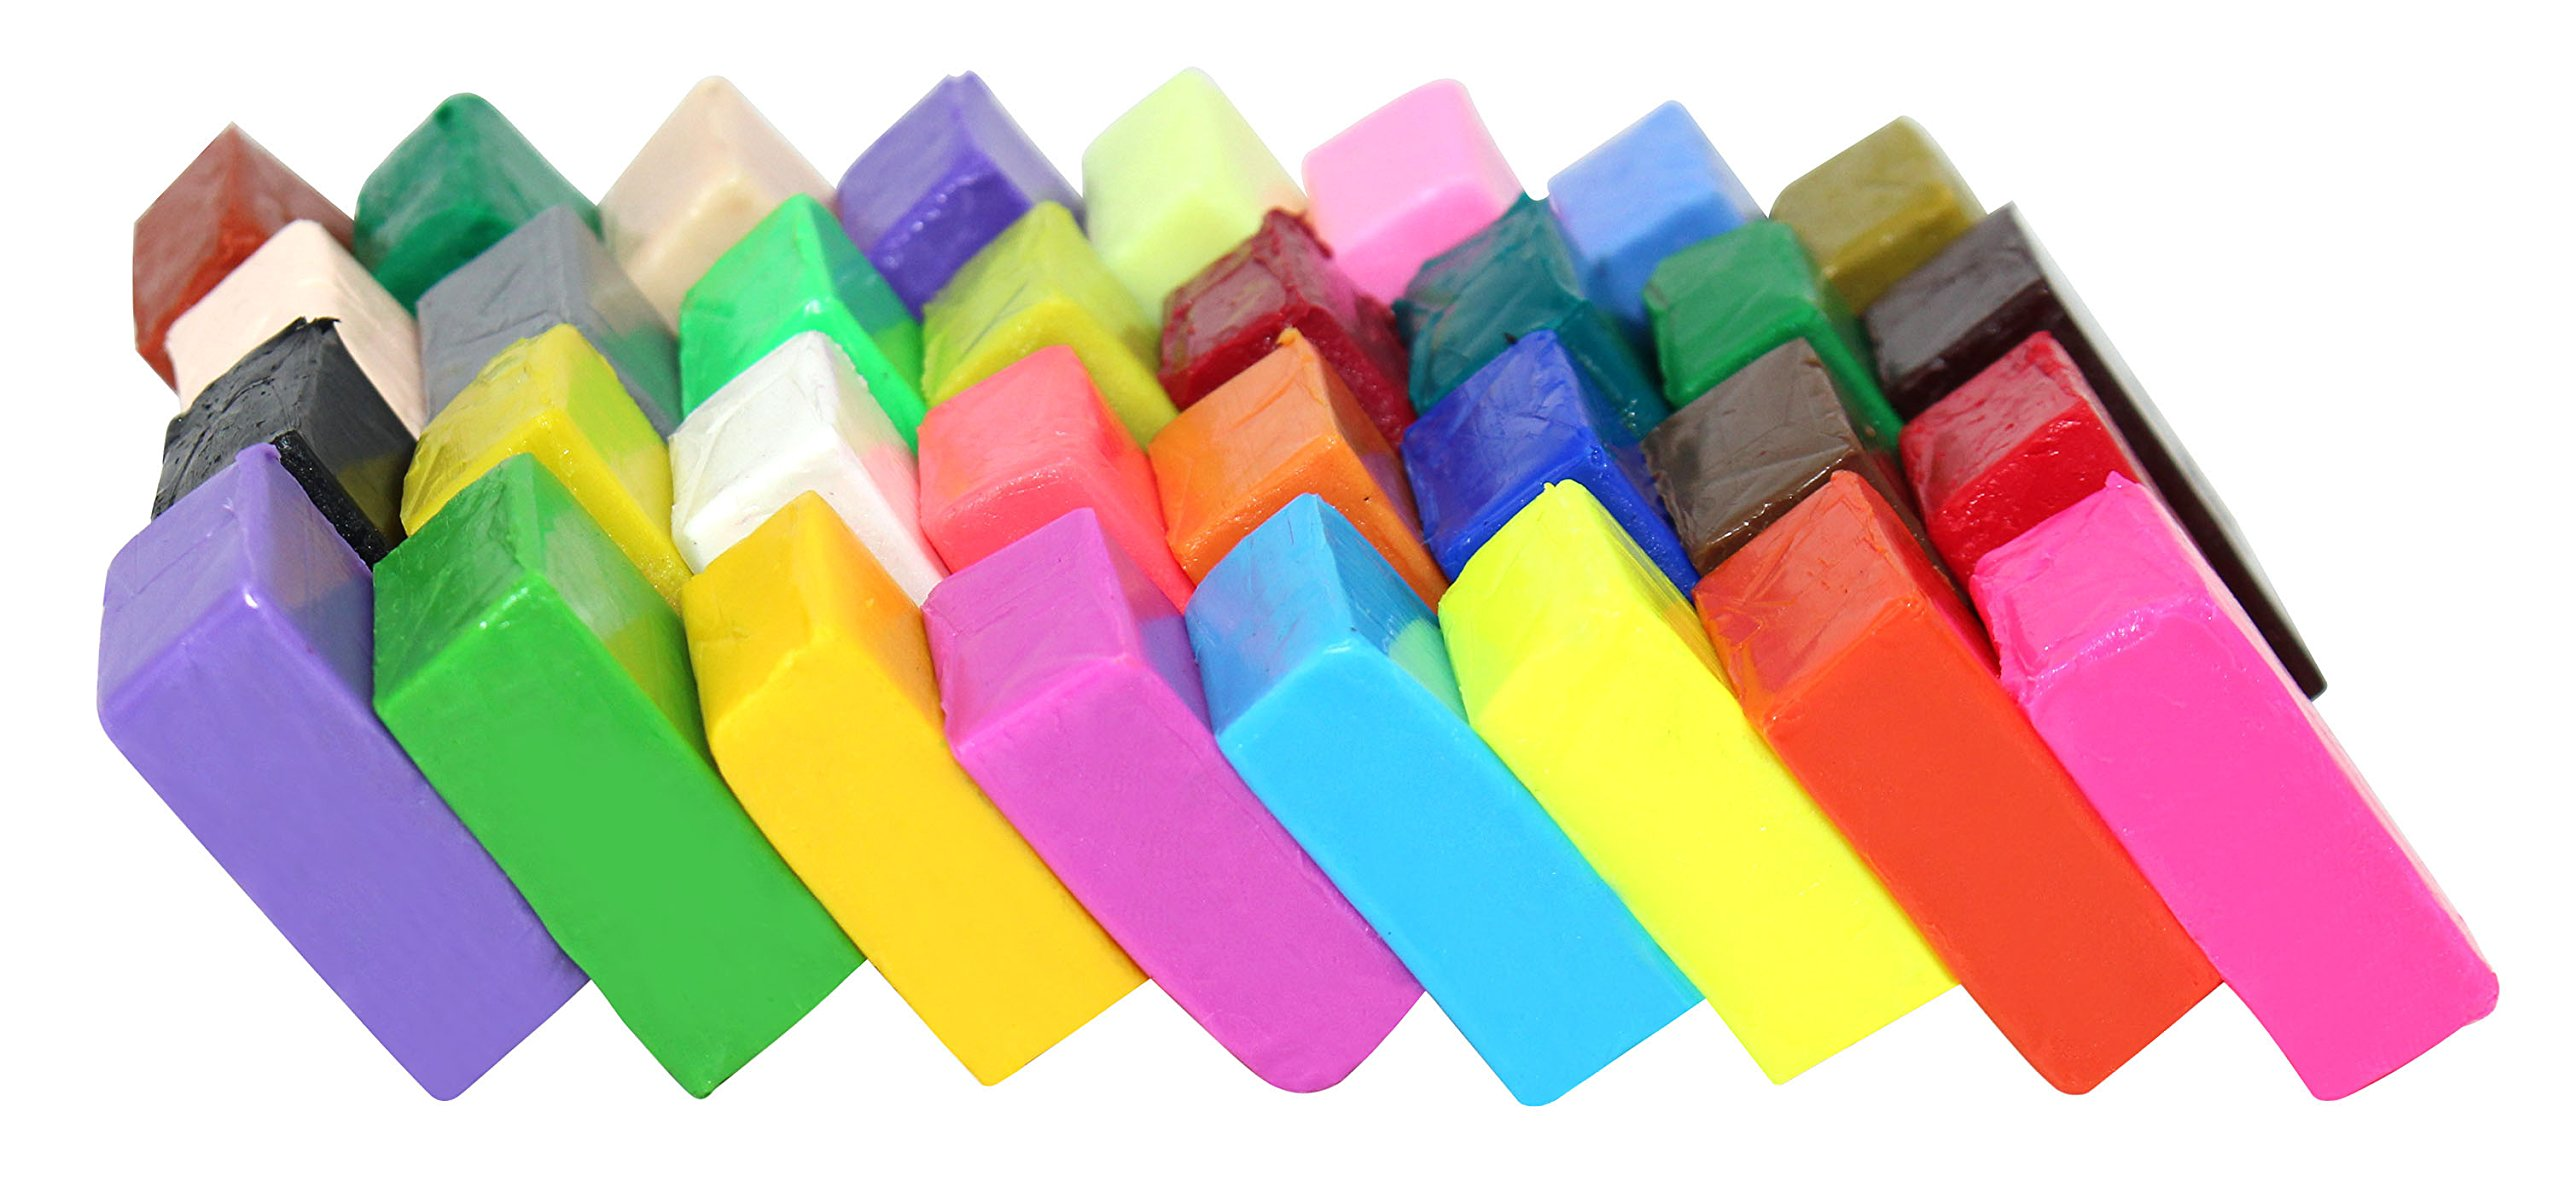 Liyuan moldura adultos proyectos creativos Bloques de arcilla polim/érica de 32 colores para horno para ni/ños efecto fimo